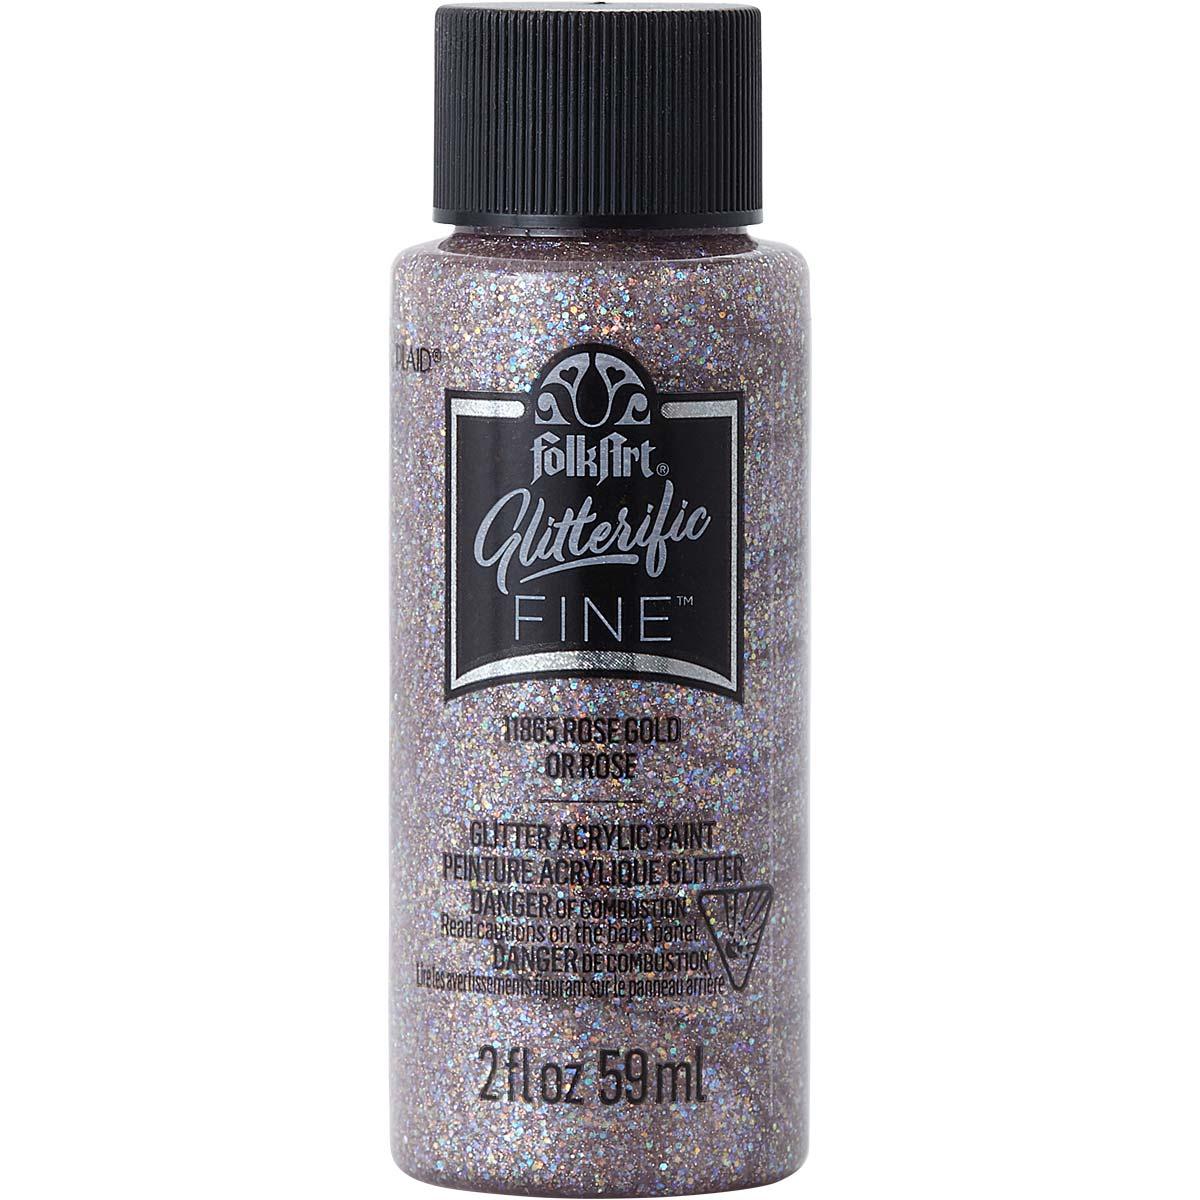 FolkArt ® Glitterific Fine™ Acrylic Paint - Rose Gold, 2 oz. - 11865